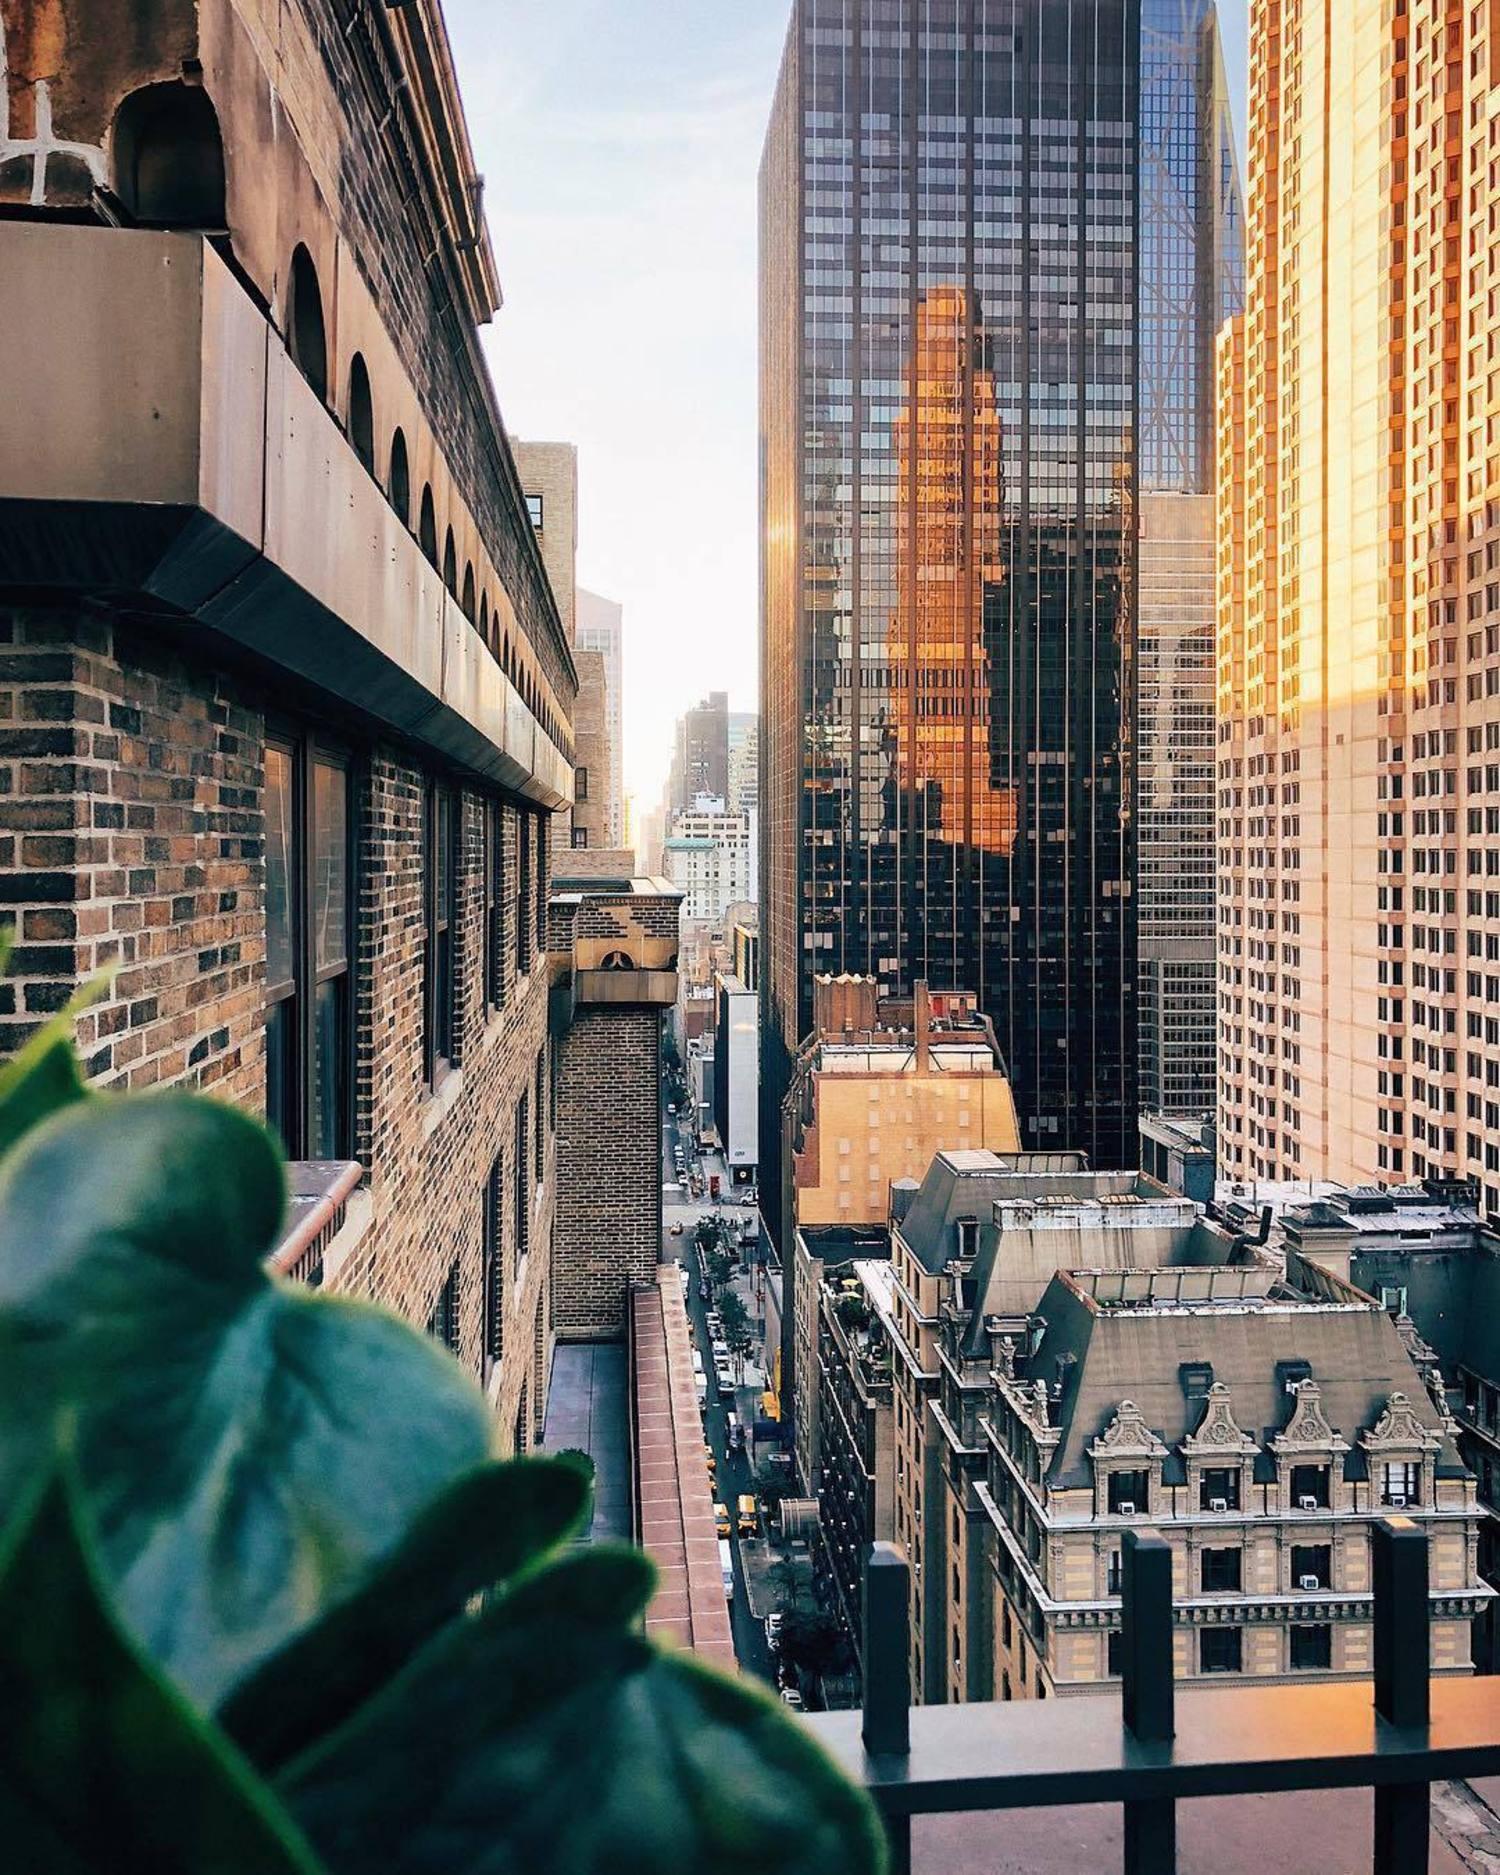 New York, New York. Photo via @melliekr #viewingnyc #newyorkcity #newyork #nyc